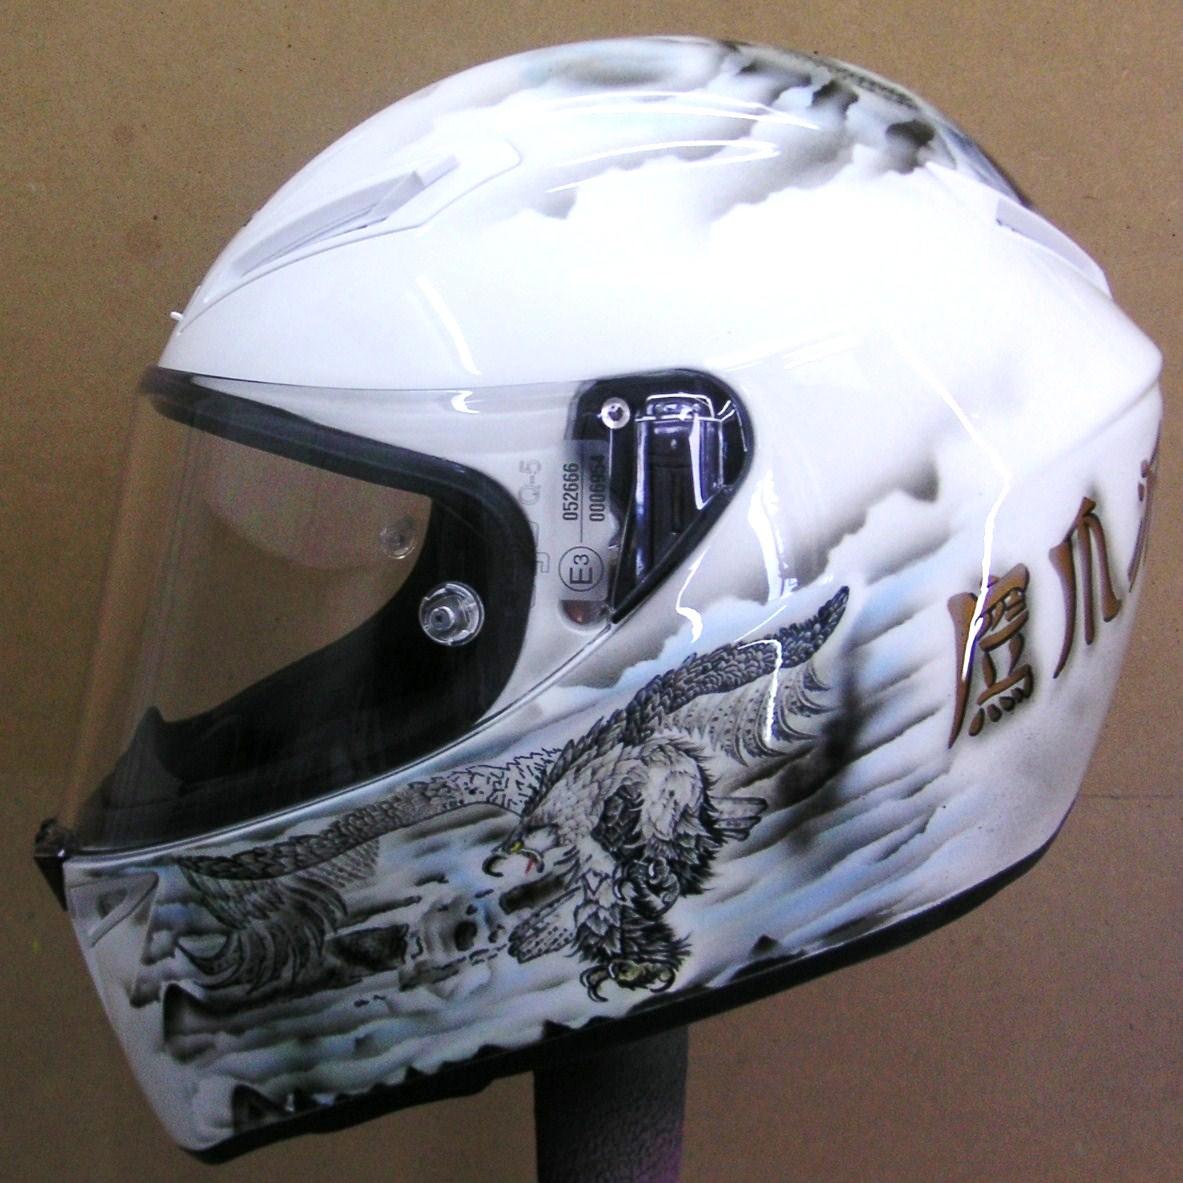 Custom Airbrushed Helmet 159 Hand Painted Helmets